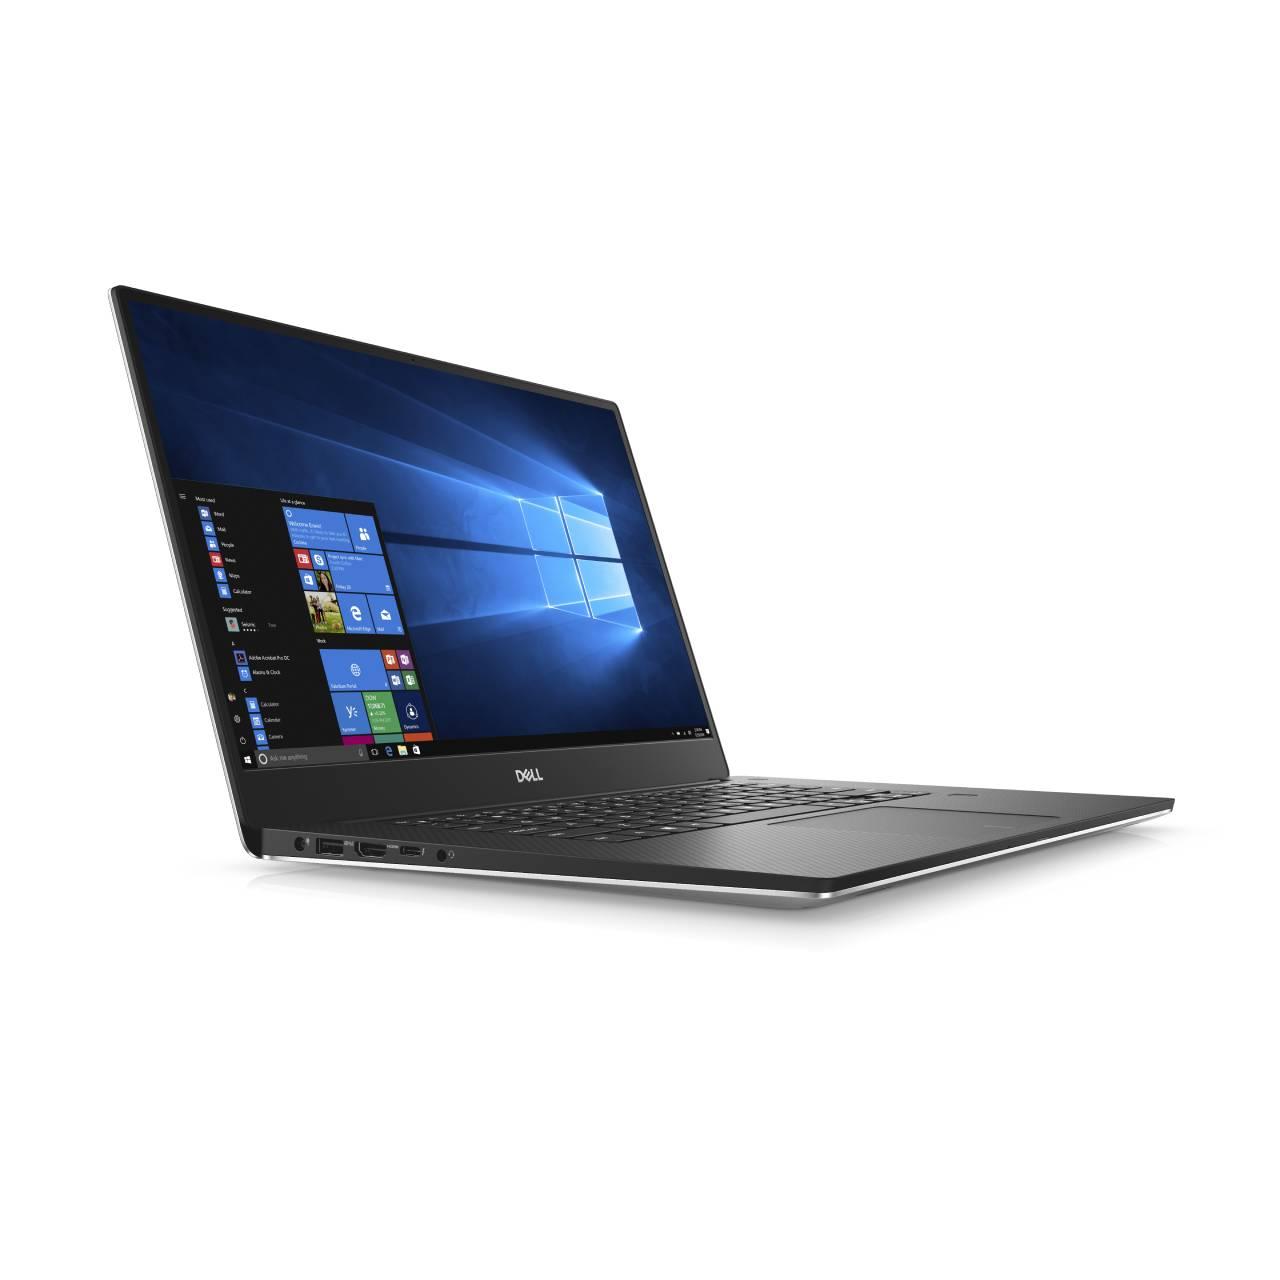 "Dell xps 15 7590 laptop 15.6"" i7-9750h nvidia gtx 1650 256gb ssd 16gb ram + $438 (rakuten points)  $1250"